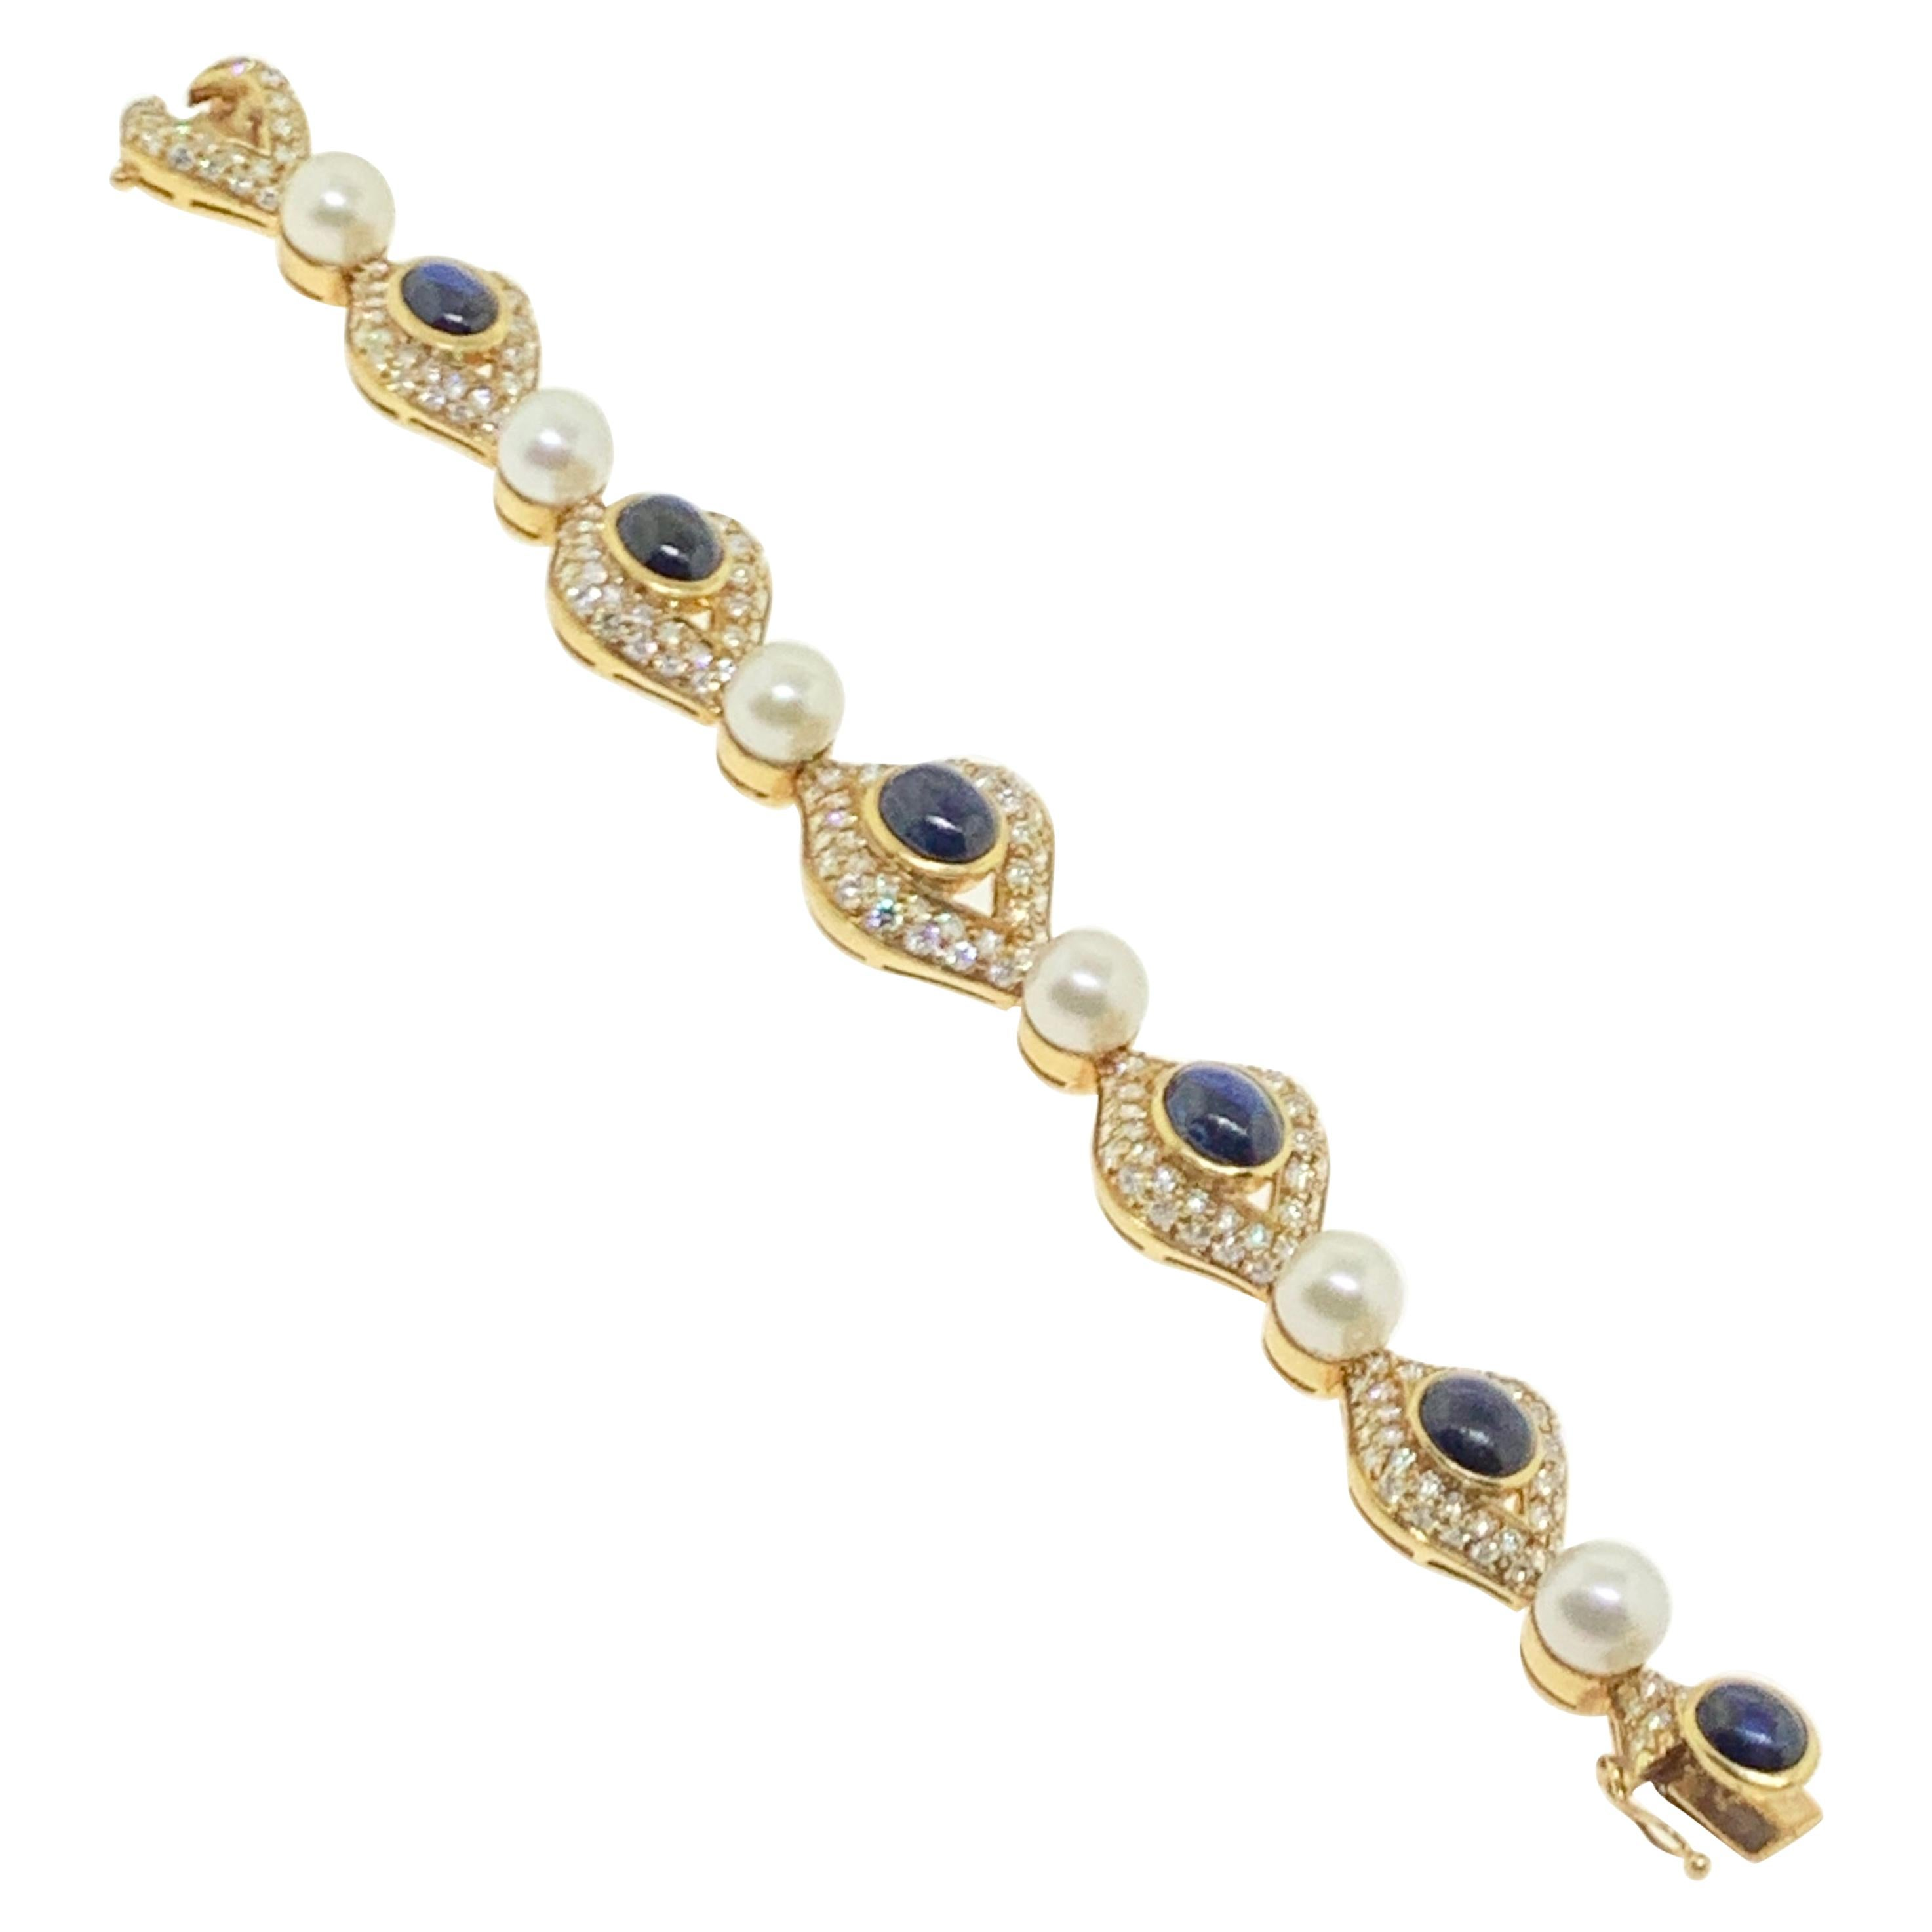 Pearl, Sapphire and Diamond Bracelet